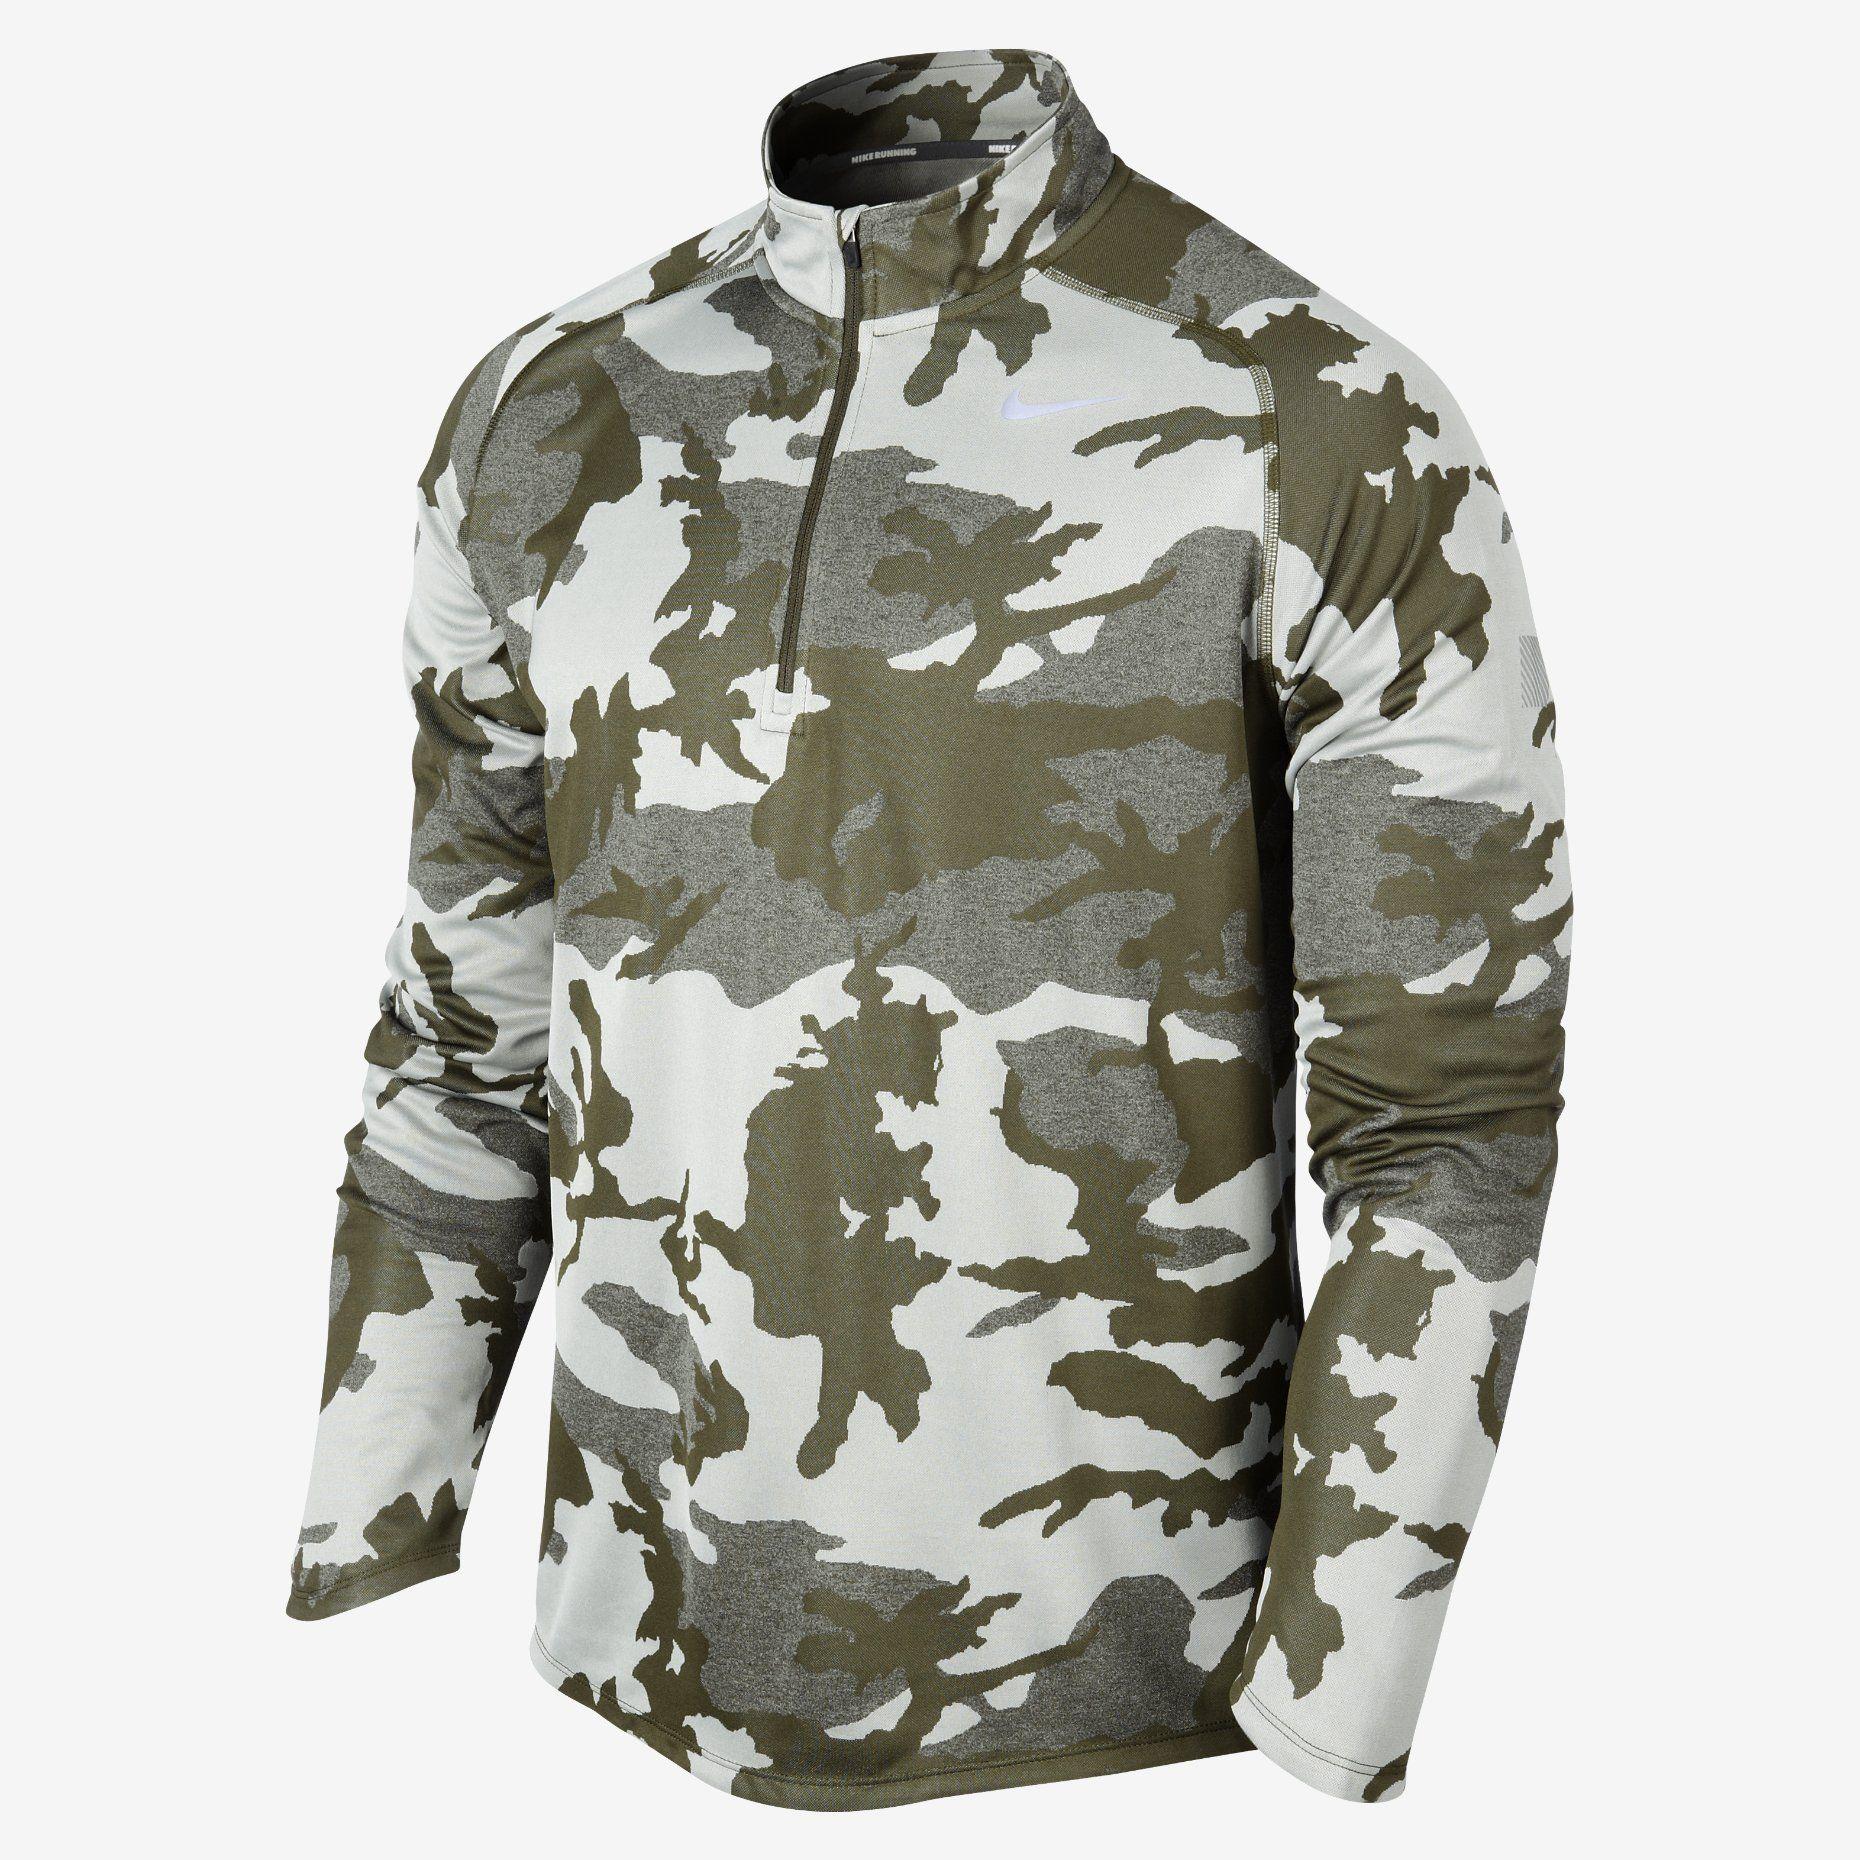 Nike element jacket men's - Nike Store Nike Element Half Zip Men S Running Shirt